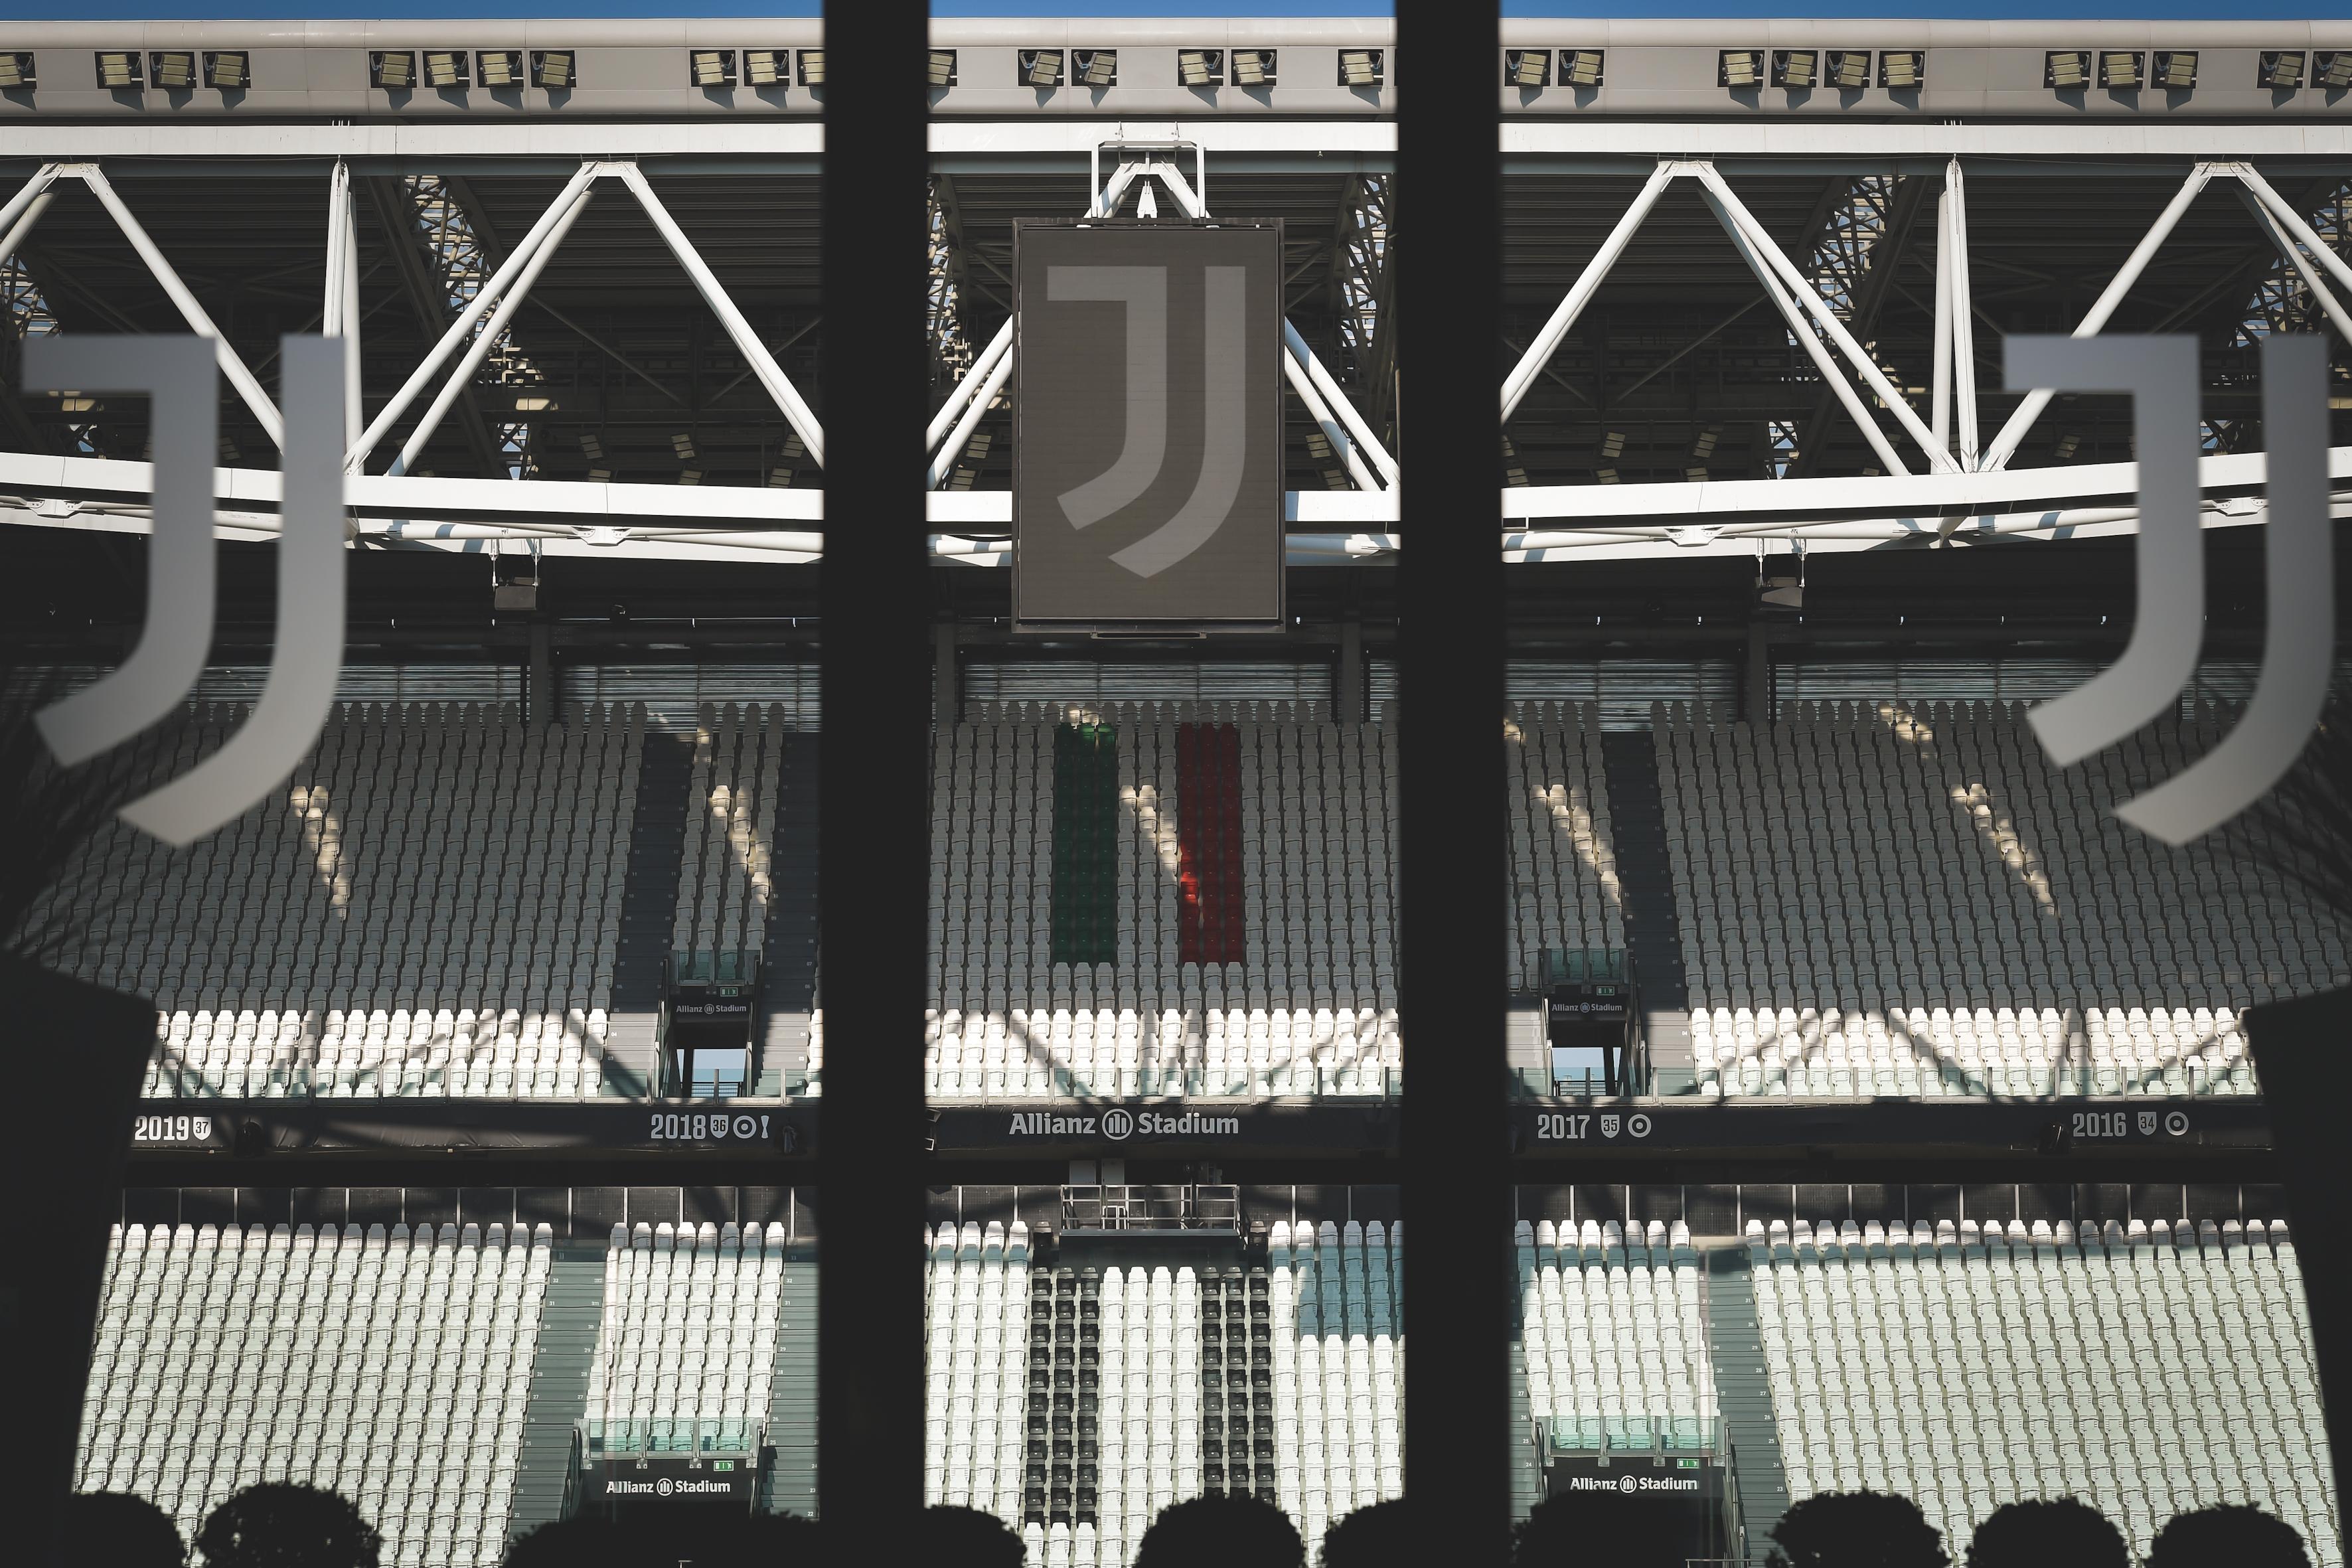 Juventus' Allianz Stadium Marks 10 Years